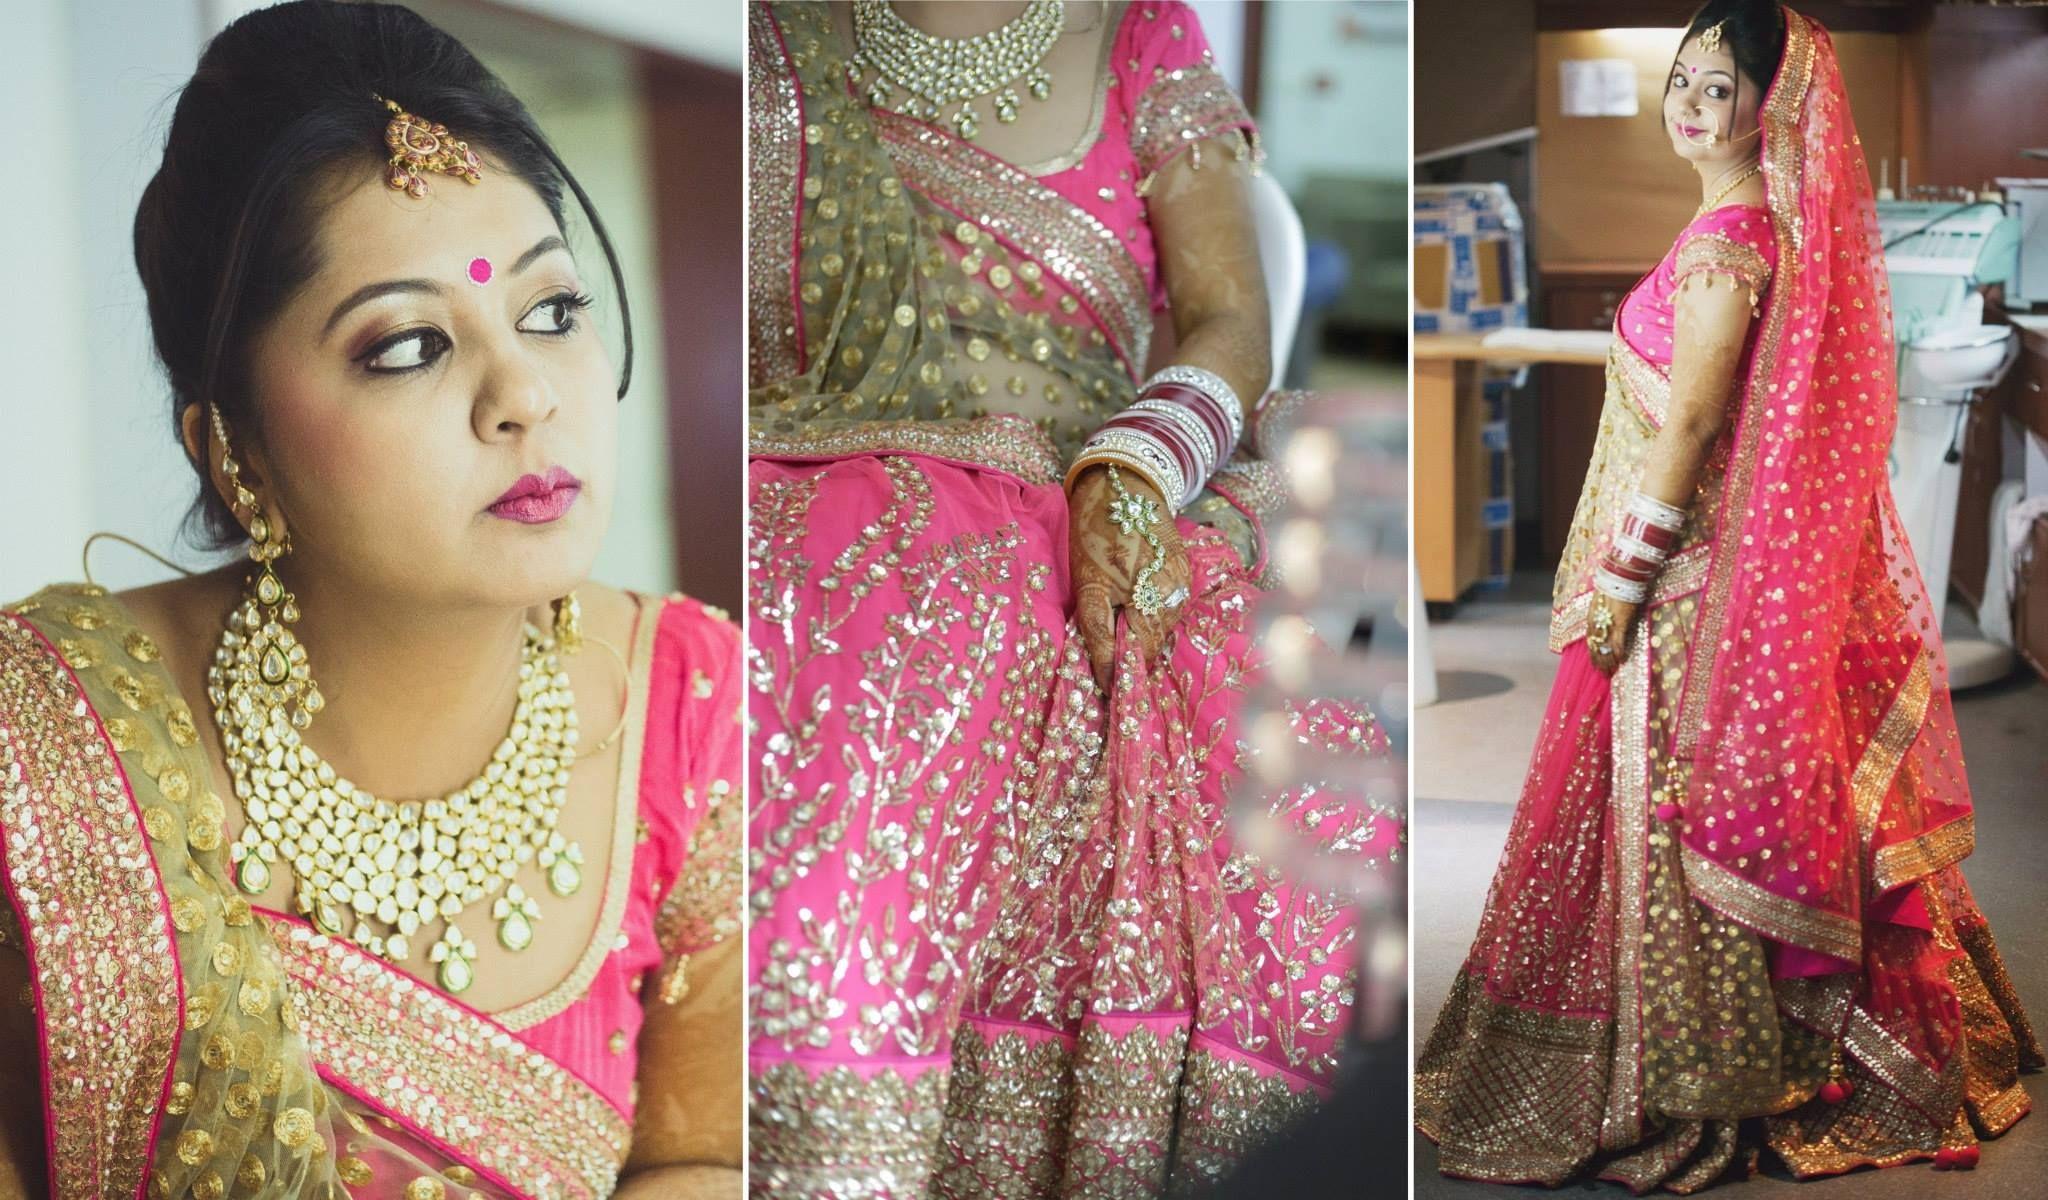 Pin de Pramila Swami en Wedding | Pinterest